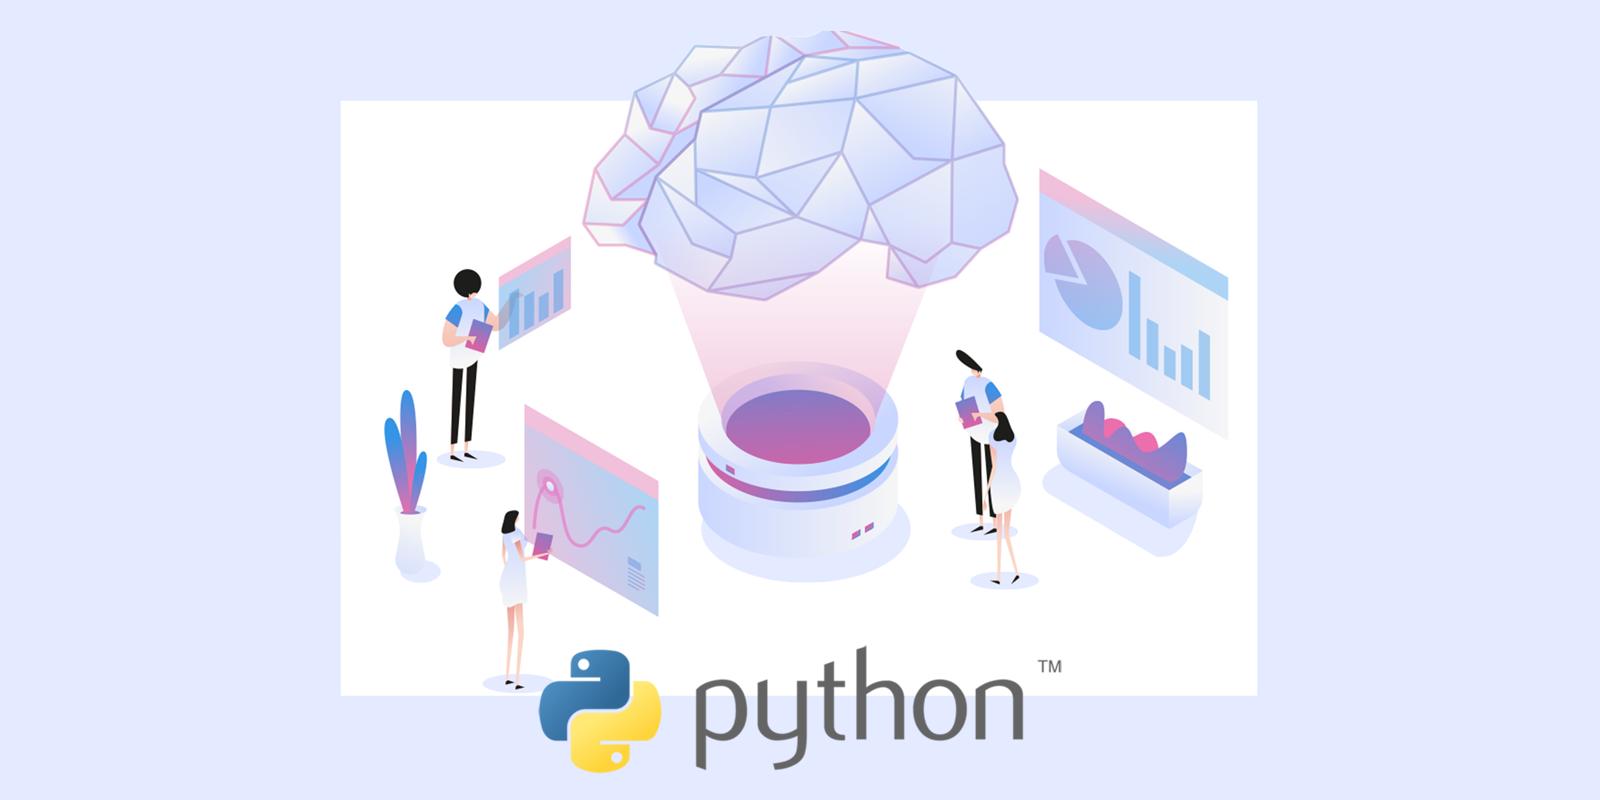 Corso in Programmazione Python Tivoli Forma Academy - machine learning 1600x800